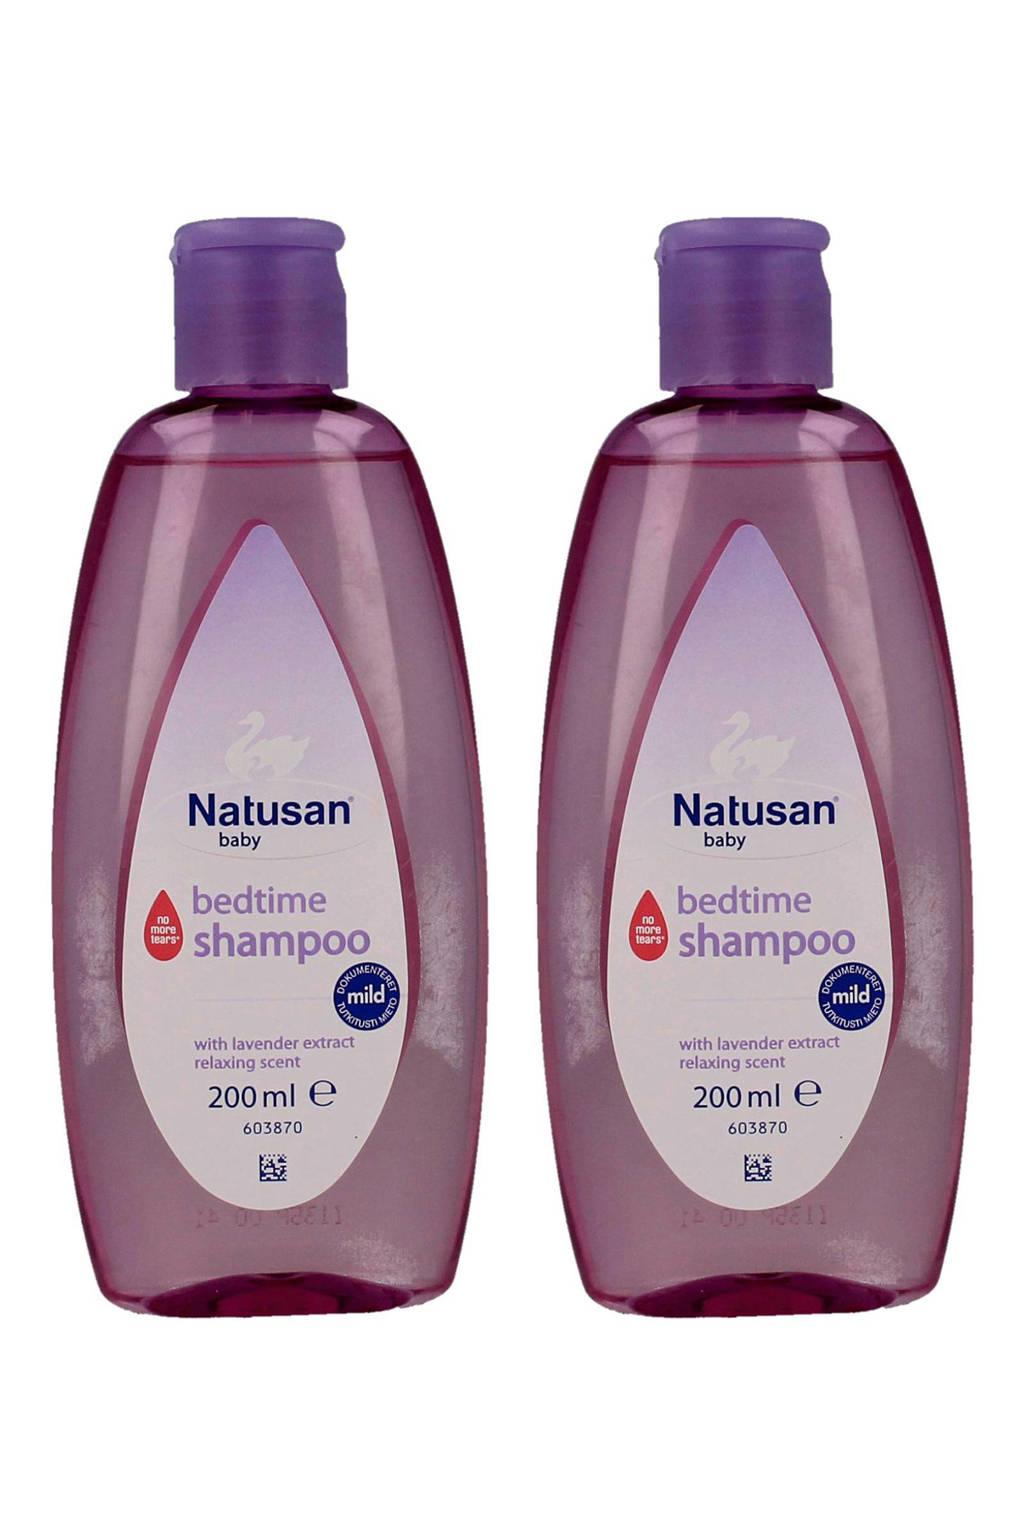 Natusan Baby Bedtime shampoo - 2 x 200 ml